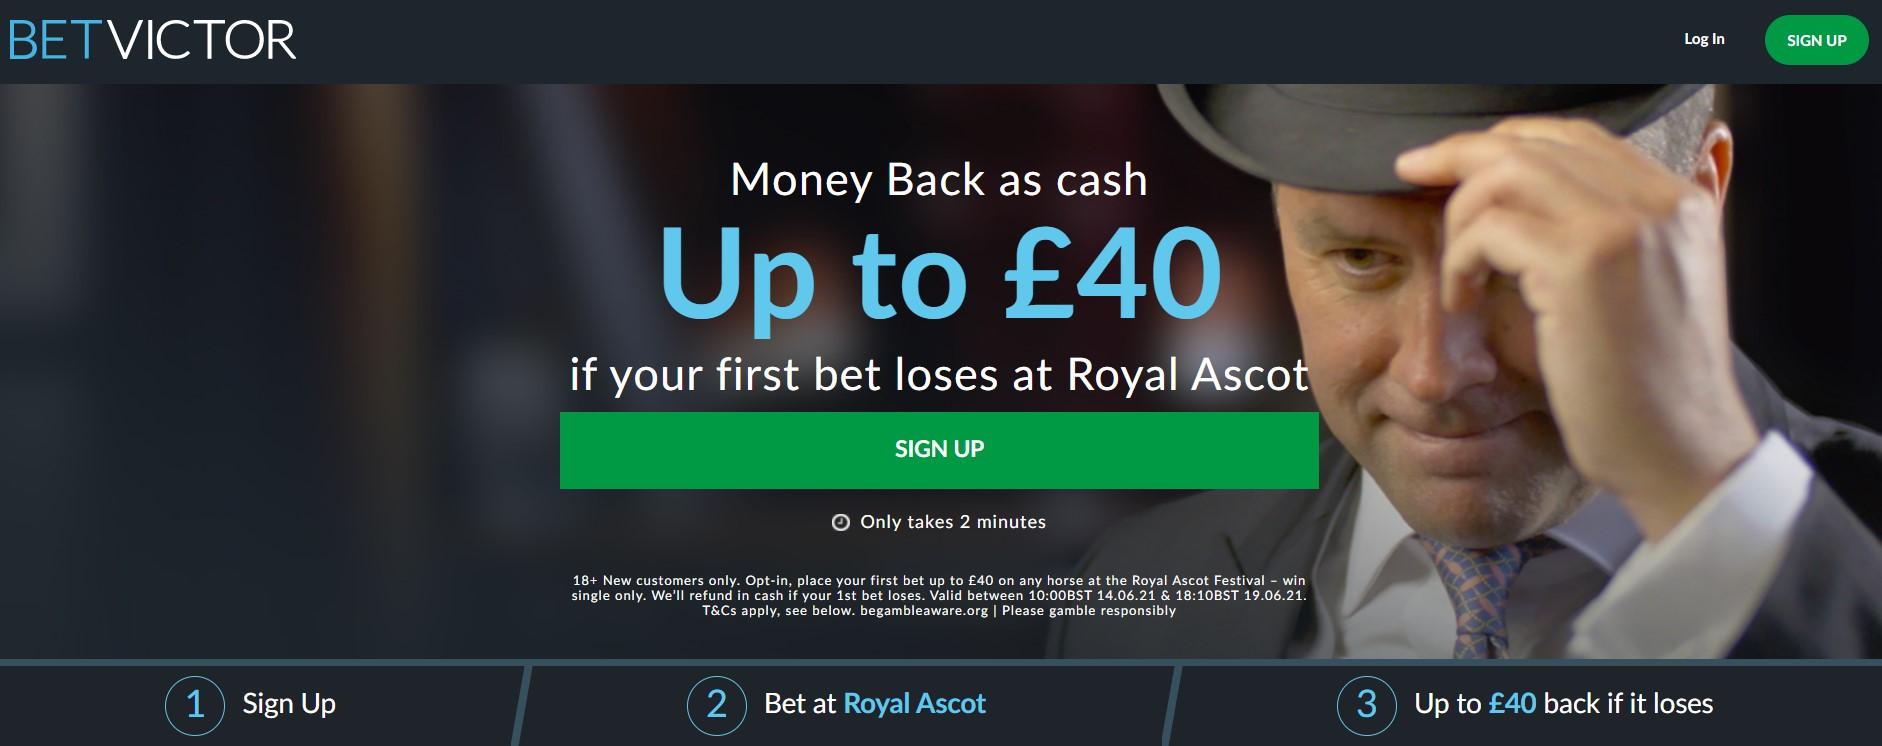 bv money back 40 ascot